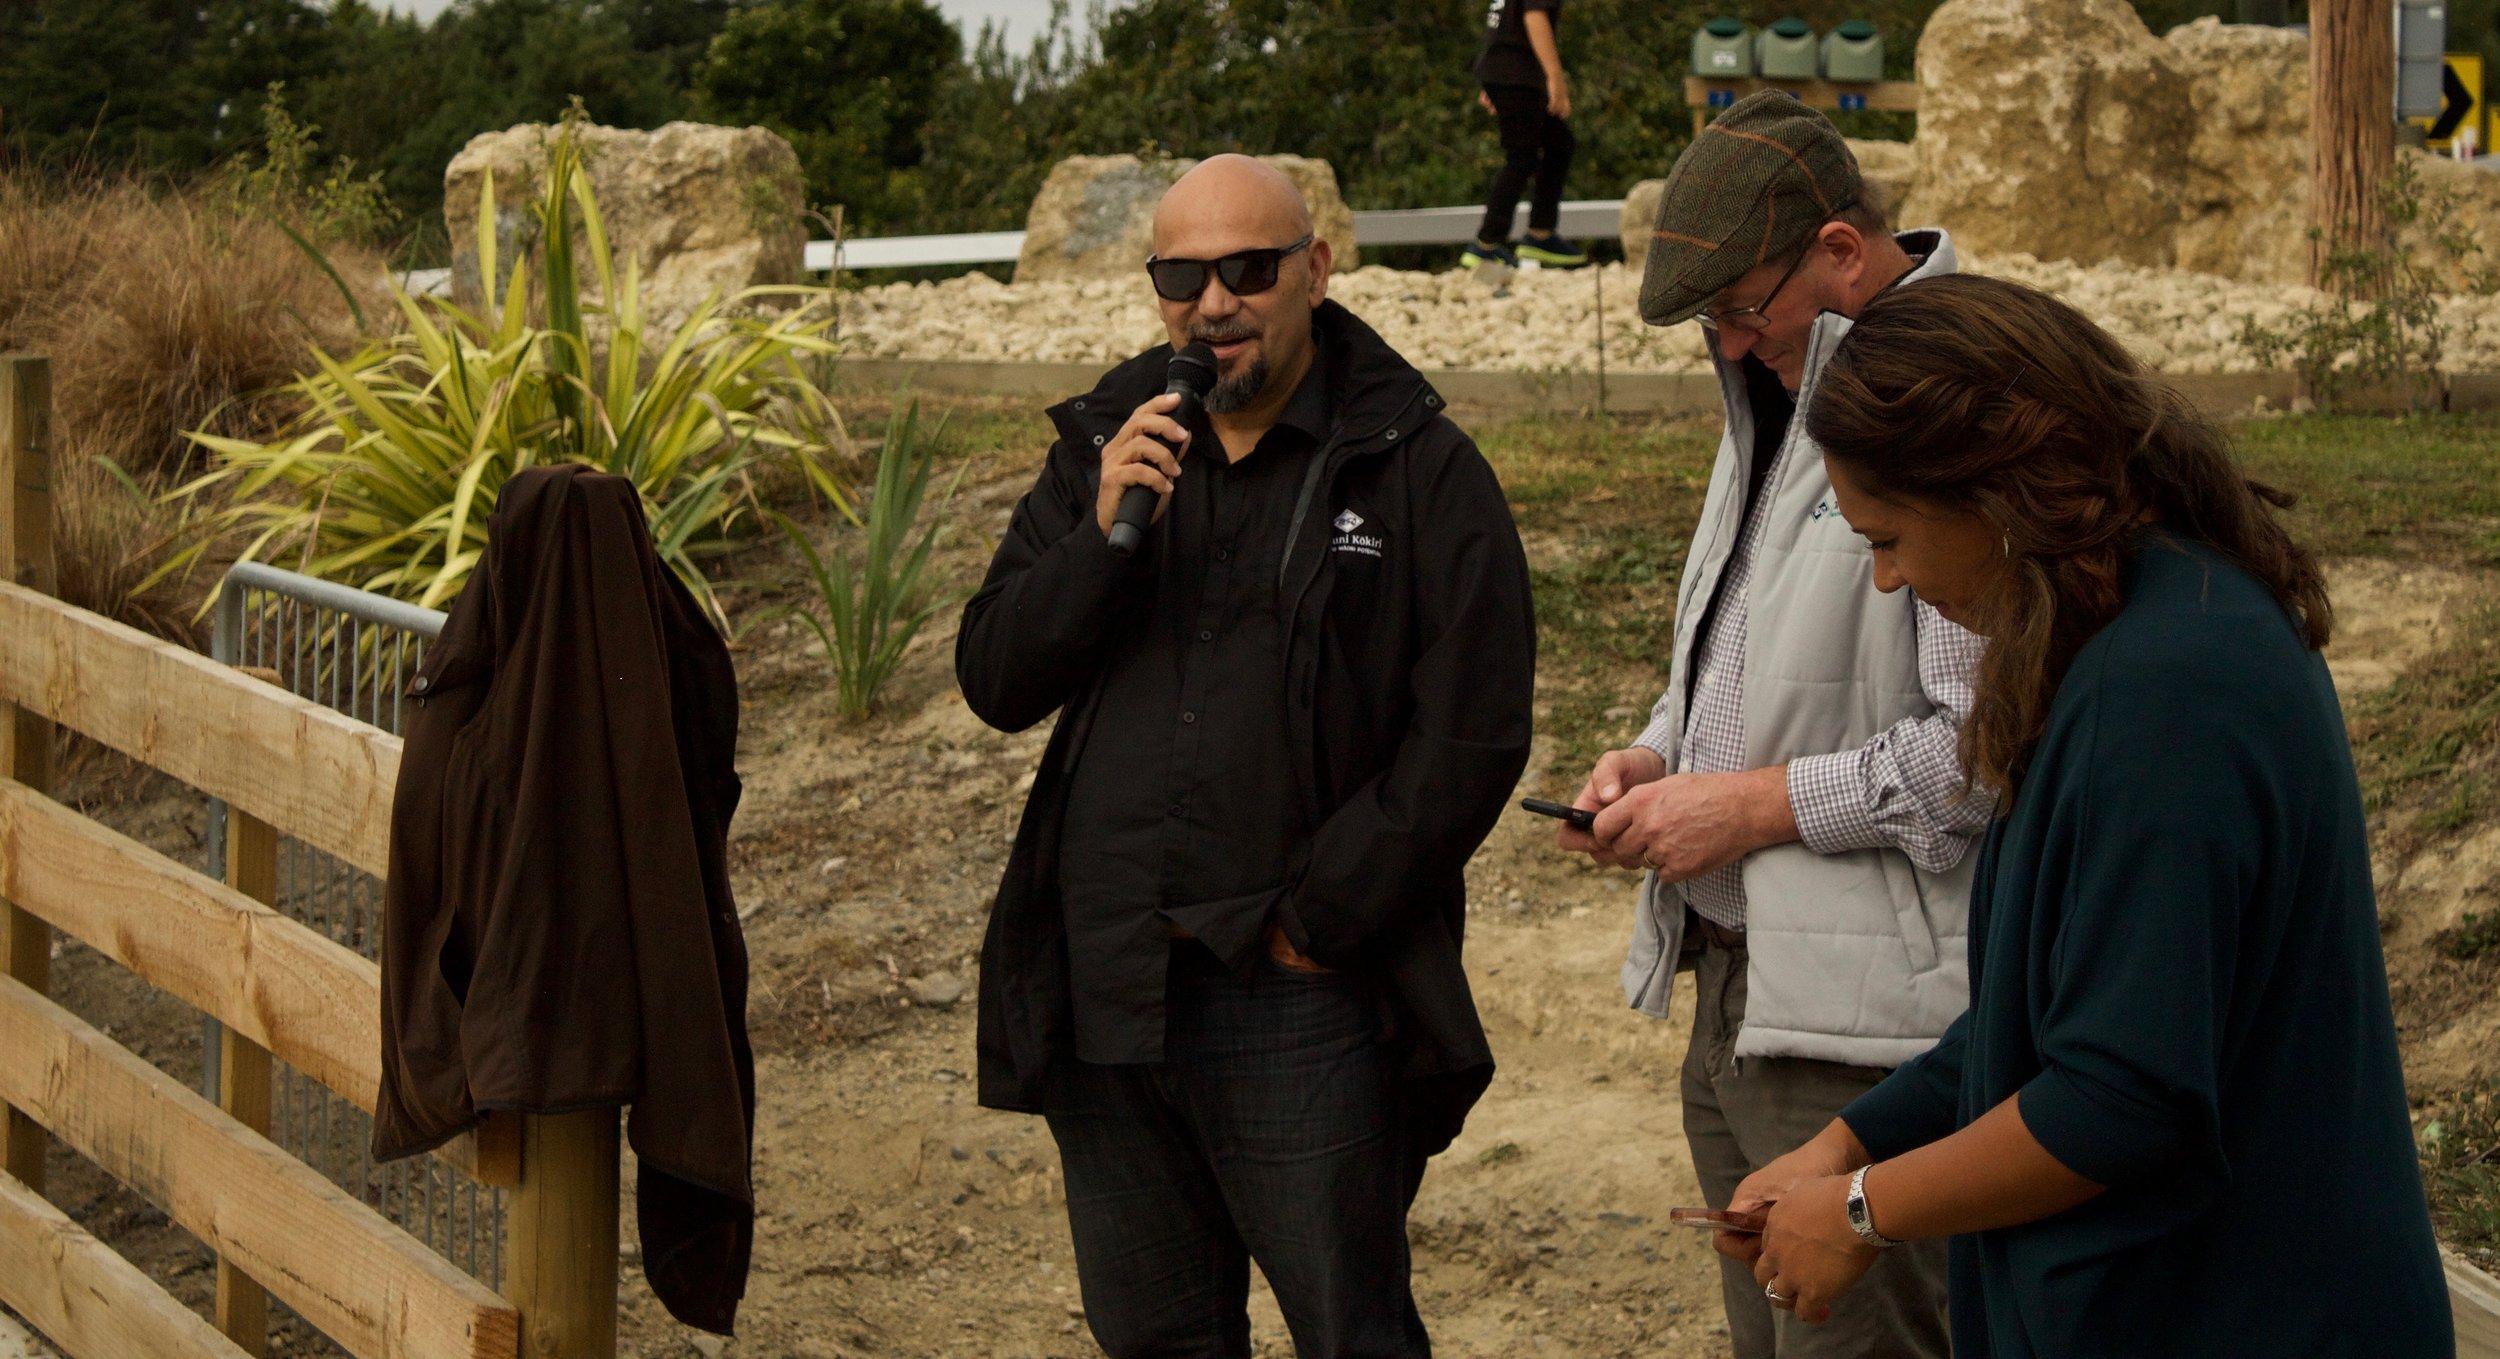 George Mackey (left) and Robert Macbeth (right) speak at the Papa Kāinga opening